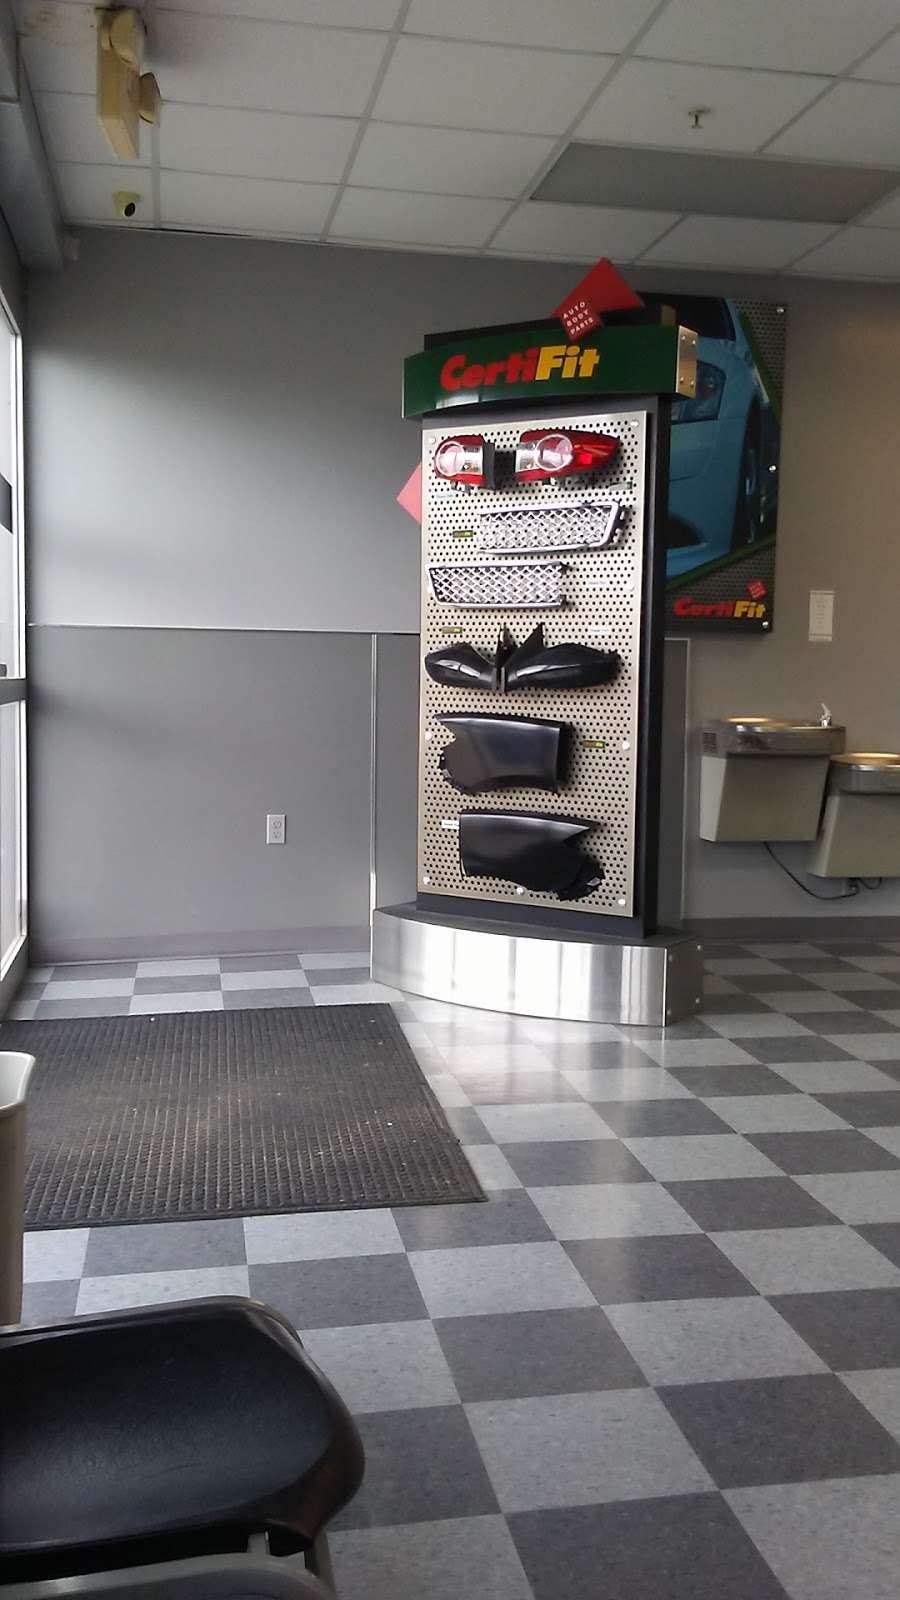 Certifit Auto Body Parts - car repair  | Photo 4 of 10 | Address: 8307 N. Loop East 610, Houston, TX 77029, USA | Phone: (713) 672-2100